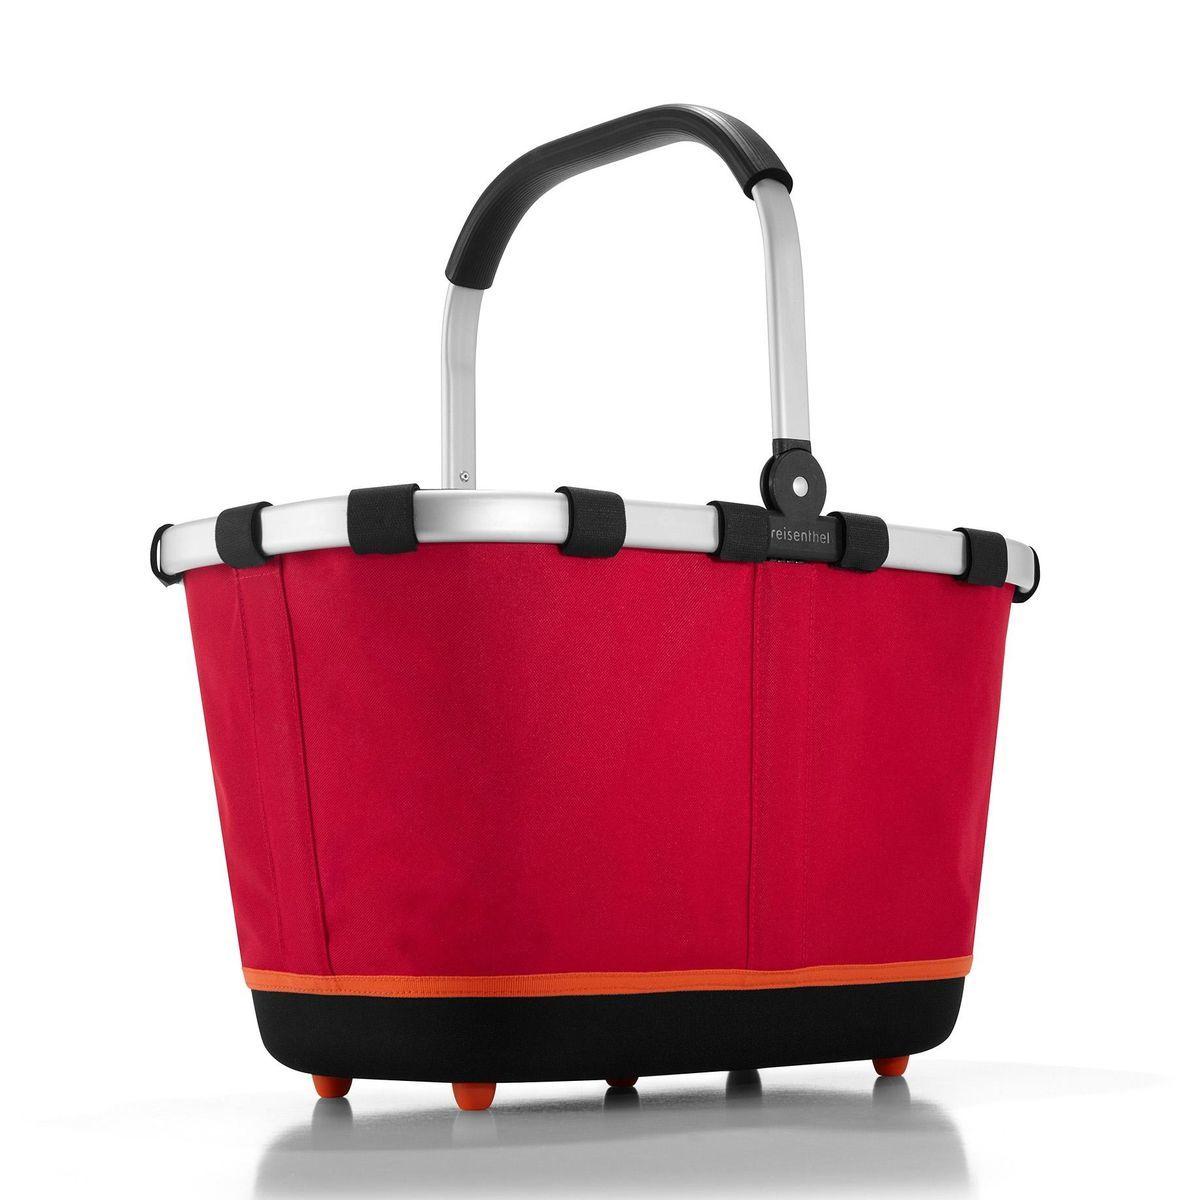 reisenthel carrybag 2 shopping bag reisenthel. Black Bedroom Furniture Sets. Home Design Ideas